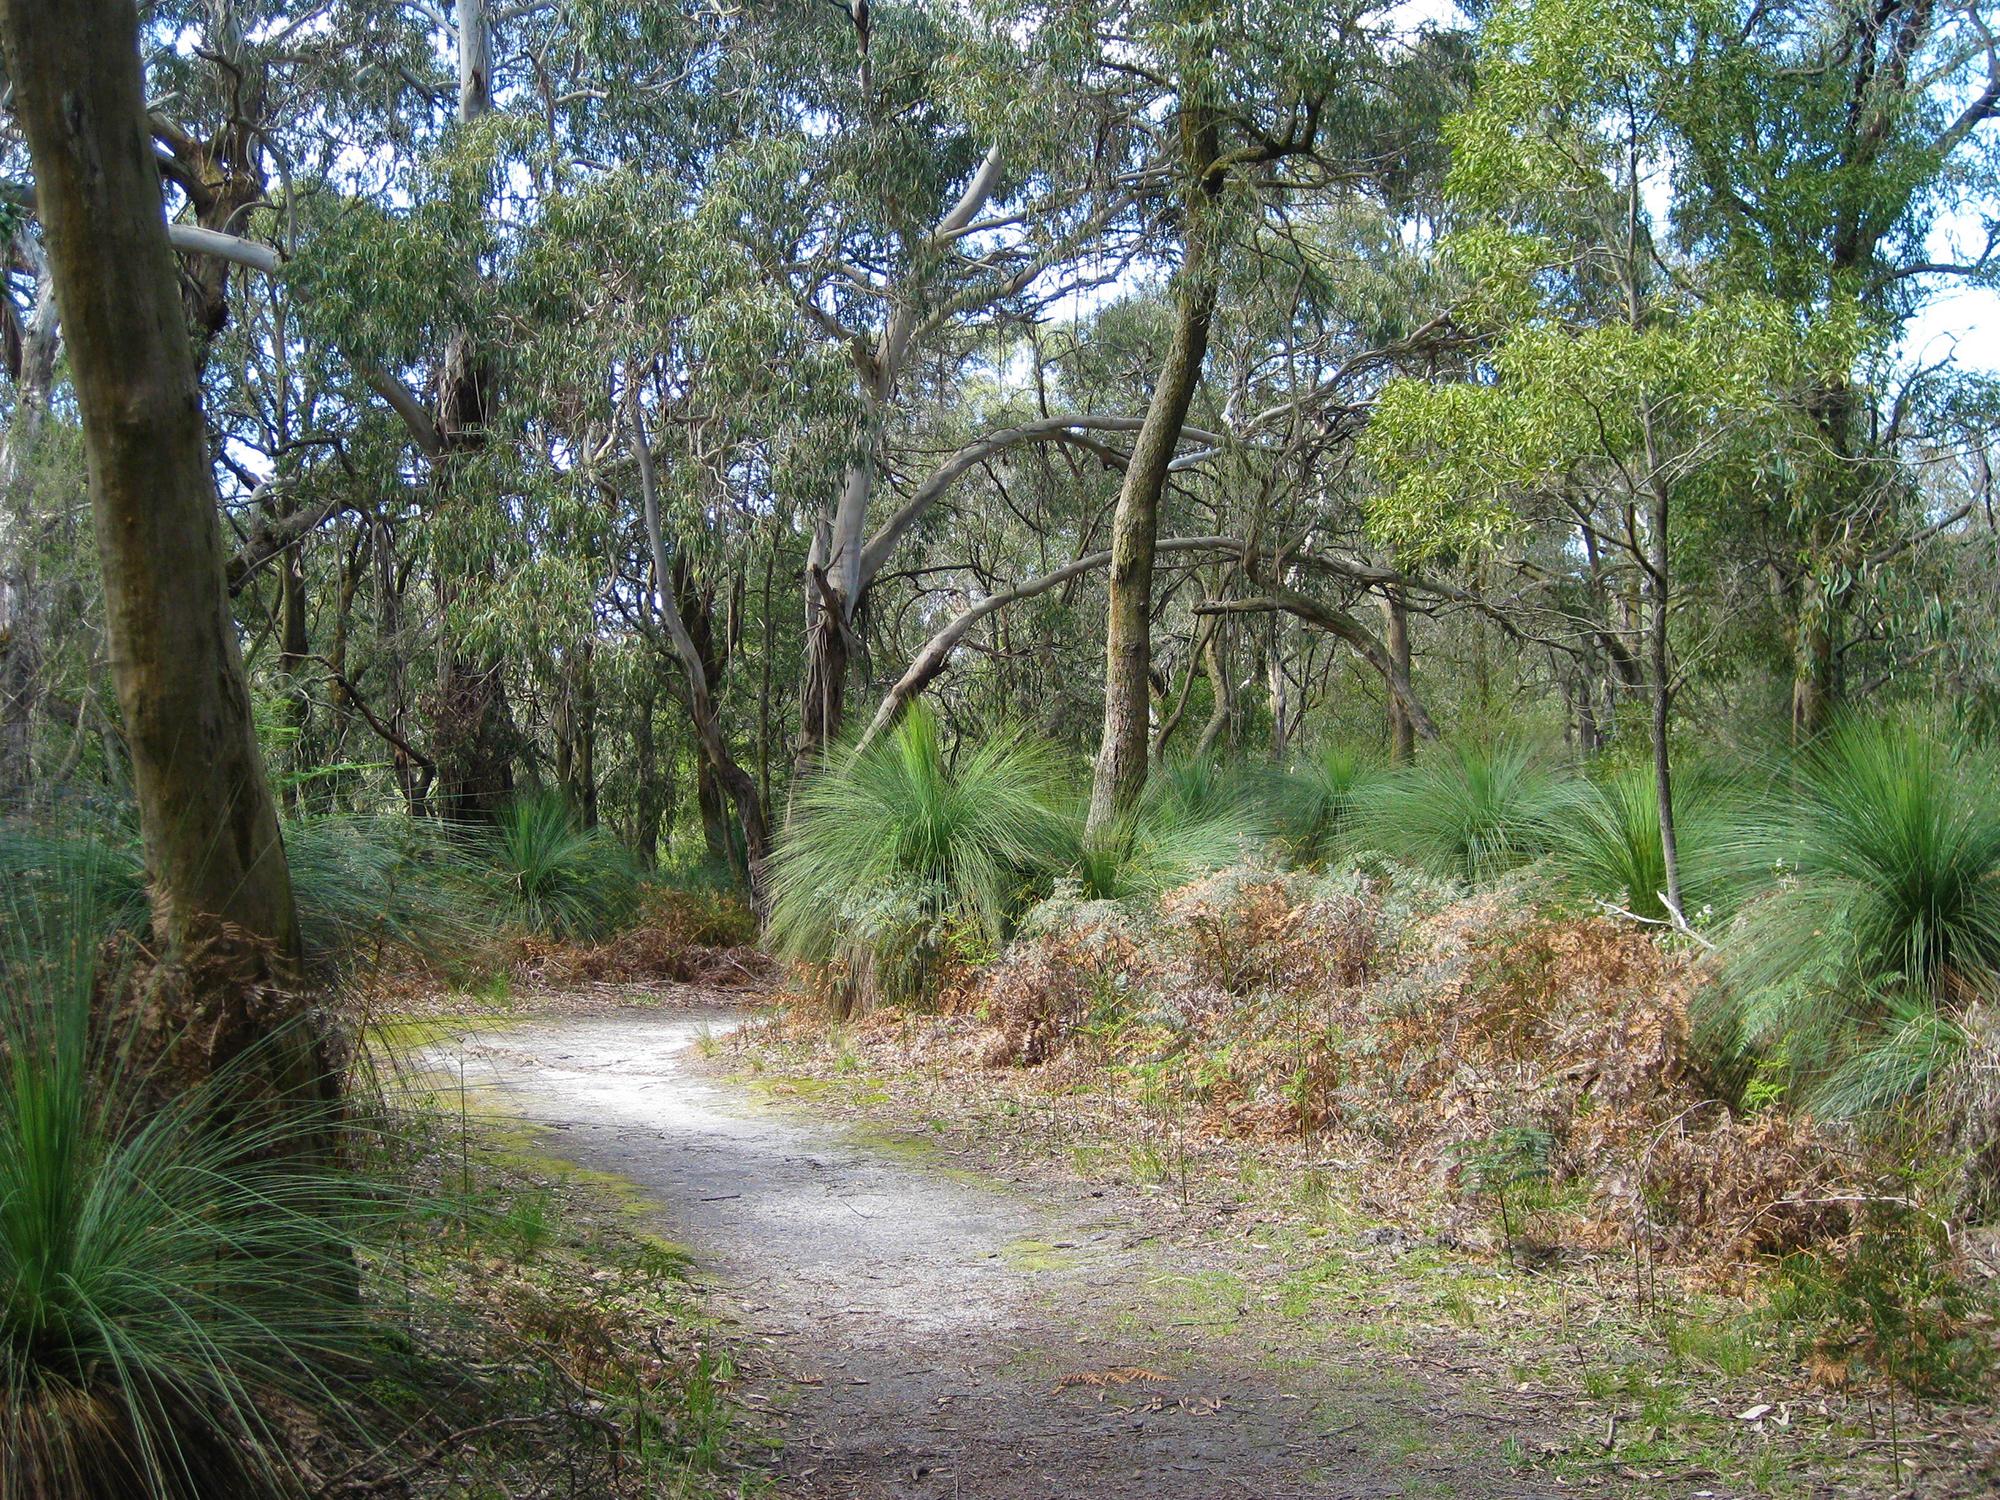 Green's Bush, Baldry Crossing, Mornington Peninsula, Victoria, Australia